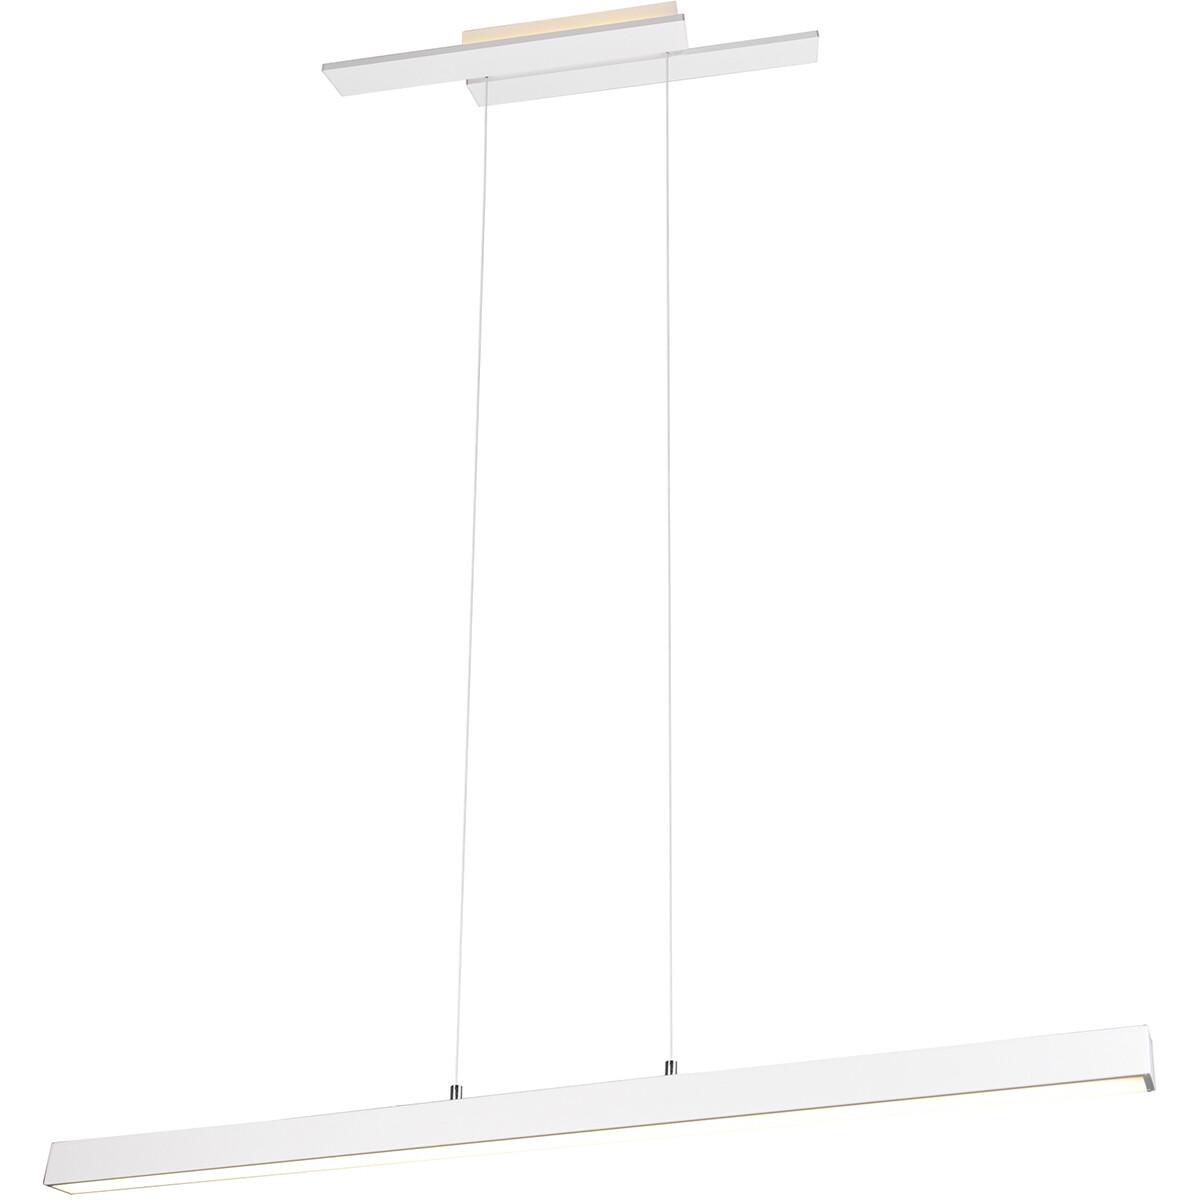 LED Hanglamp - Trion Balfy - 44W - Natuurlijk Wit 4000K - Rechthoek - Mat Wit - Aluminium